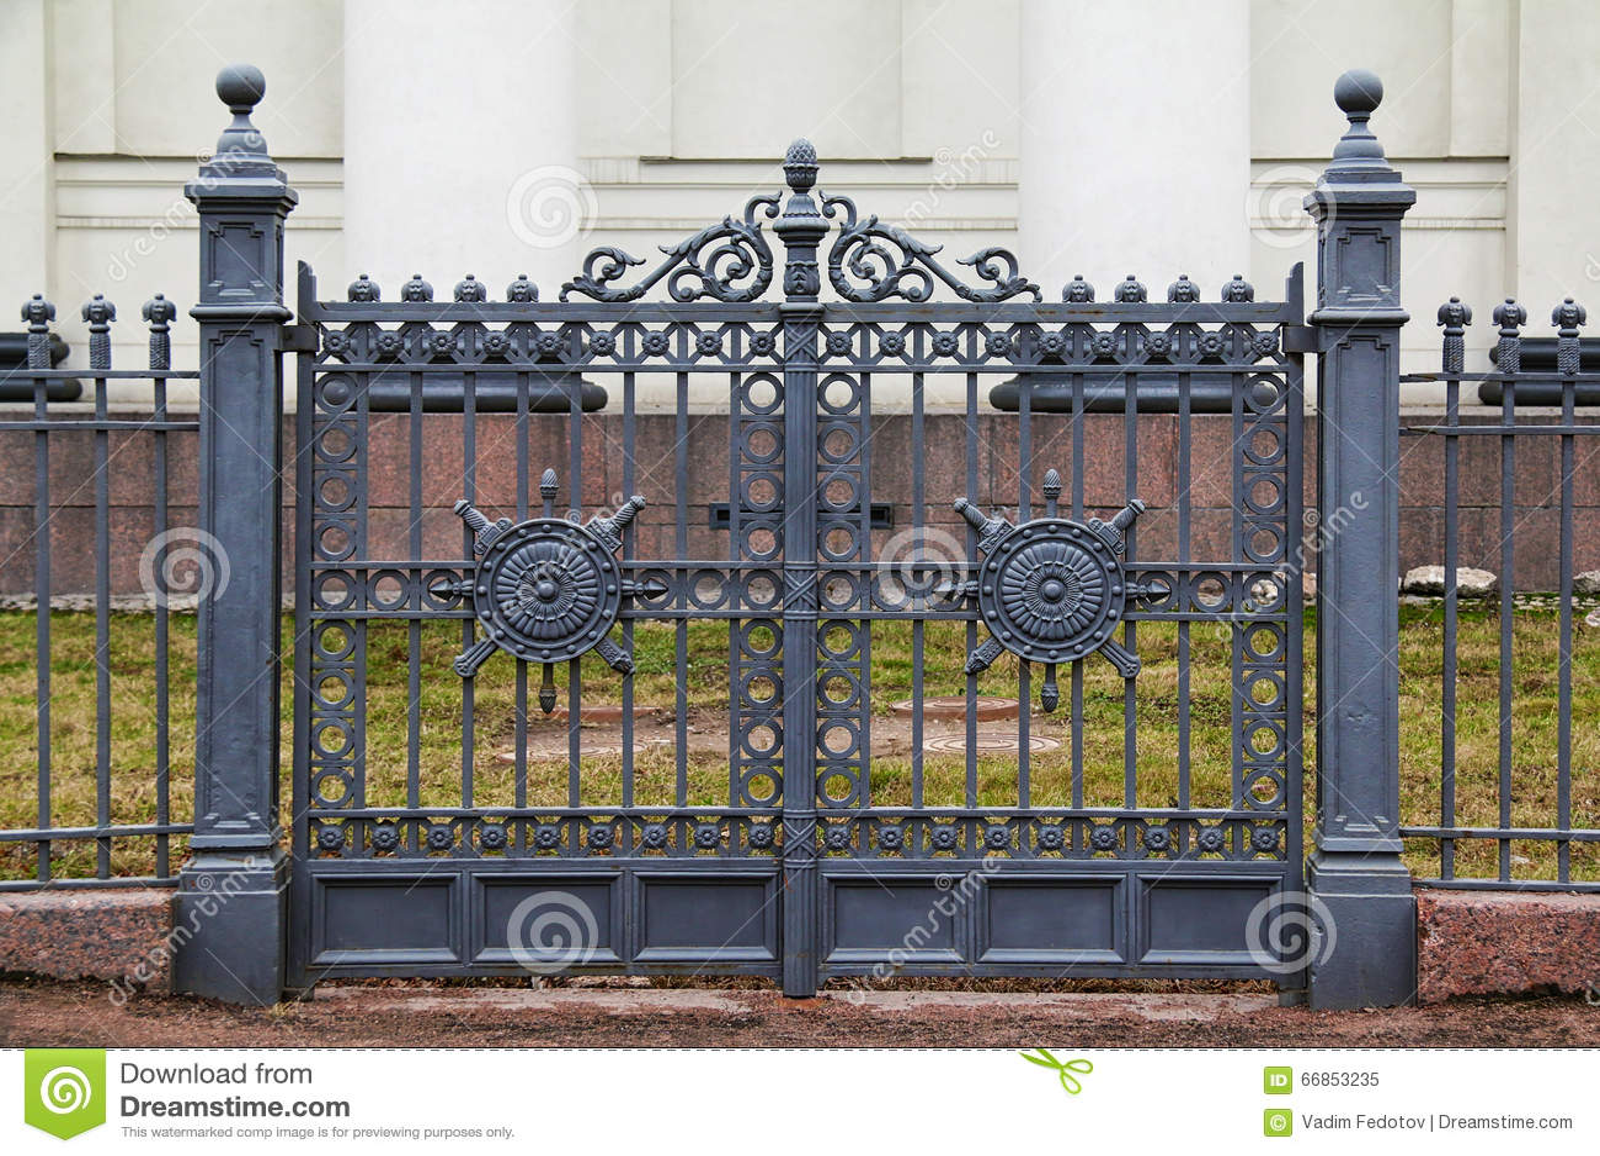 Wrought iron ornamental gates stock photo image